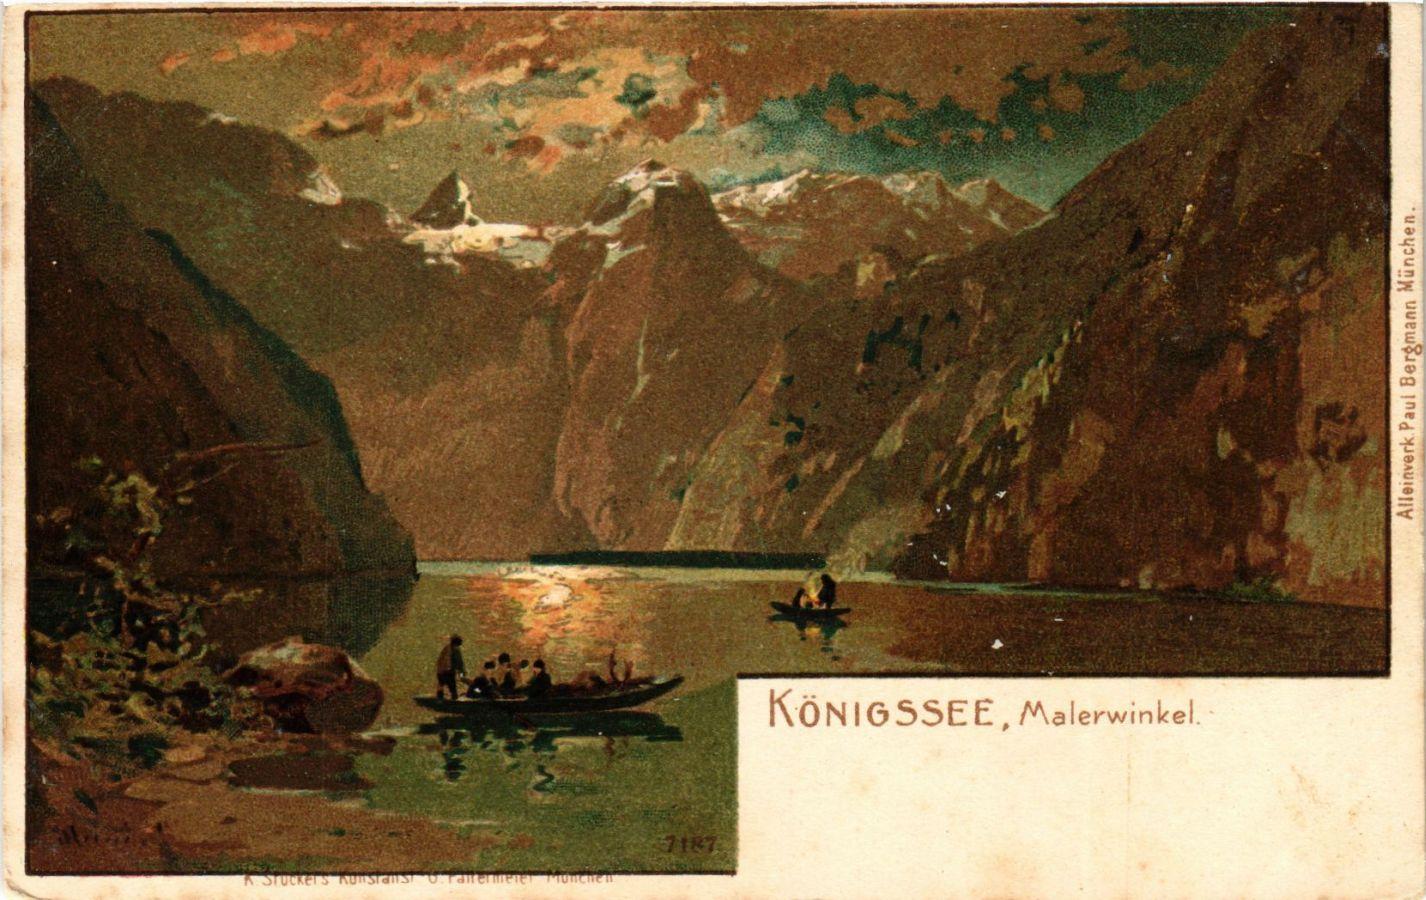 CPA-AK-Konigssee-Malerwinkel-GERMANY-879433